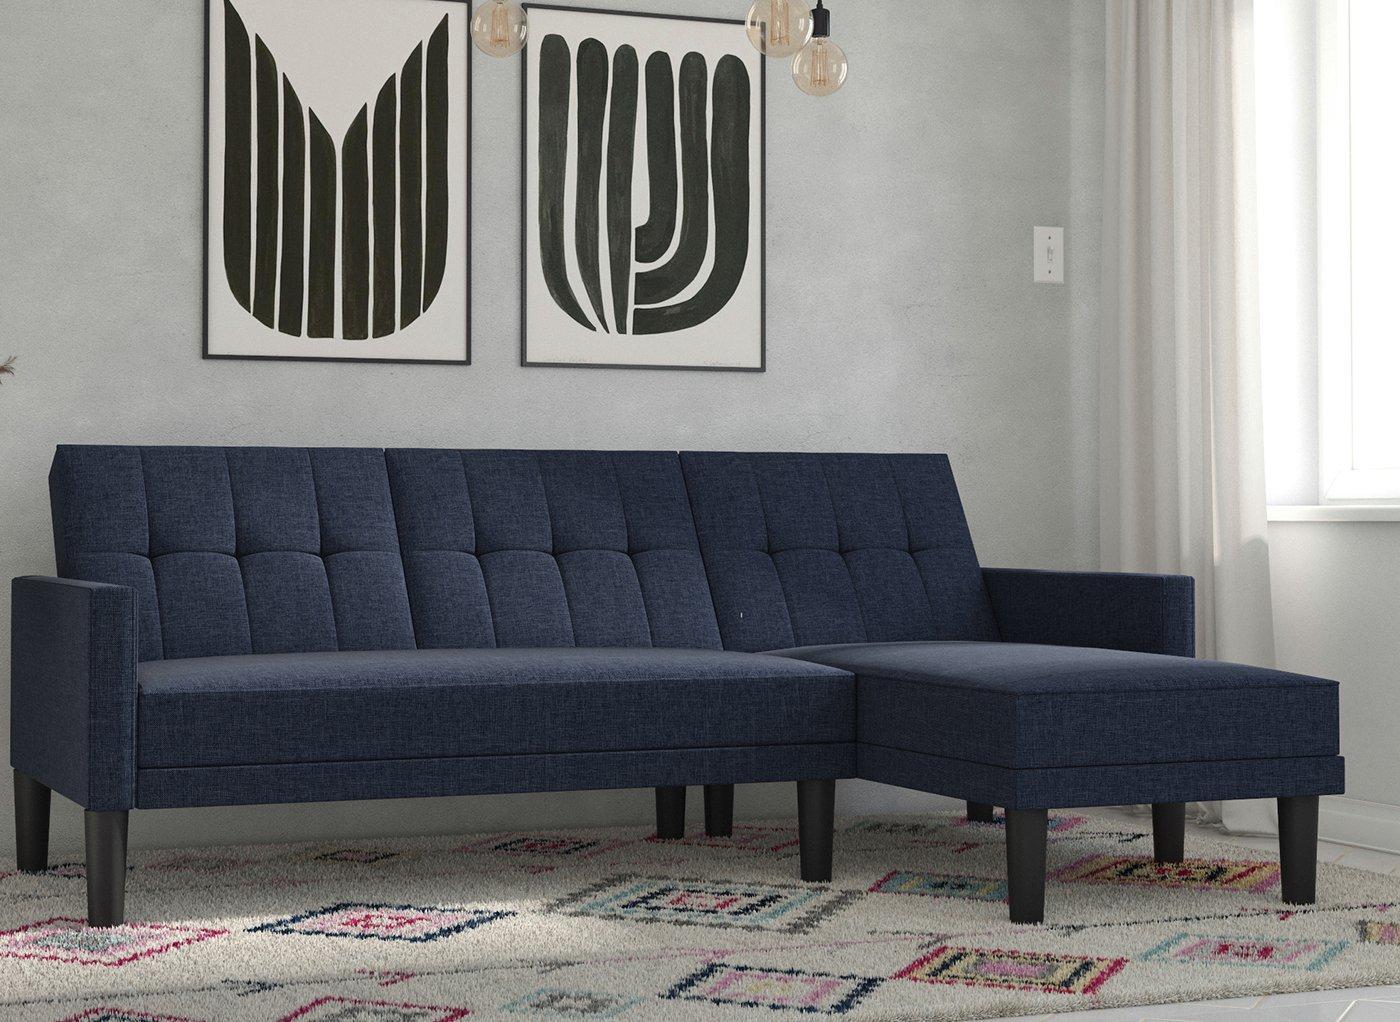 Valentina 3 Seater Corner Sofa Bed - Navy BLUE